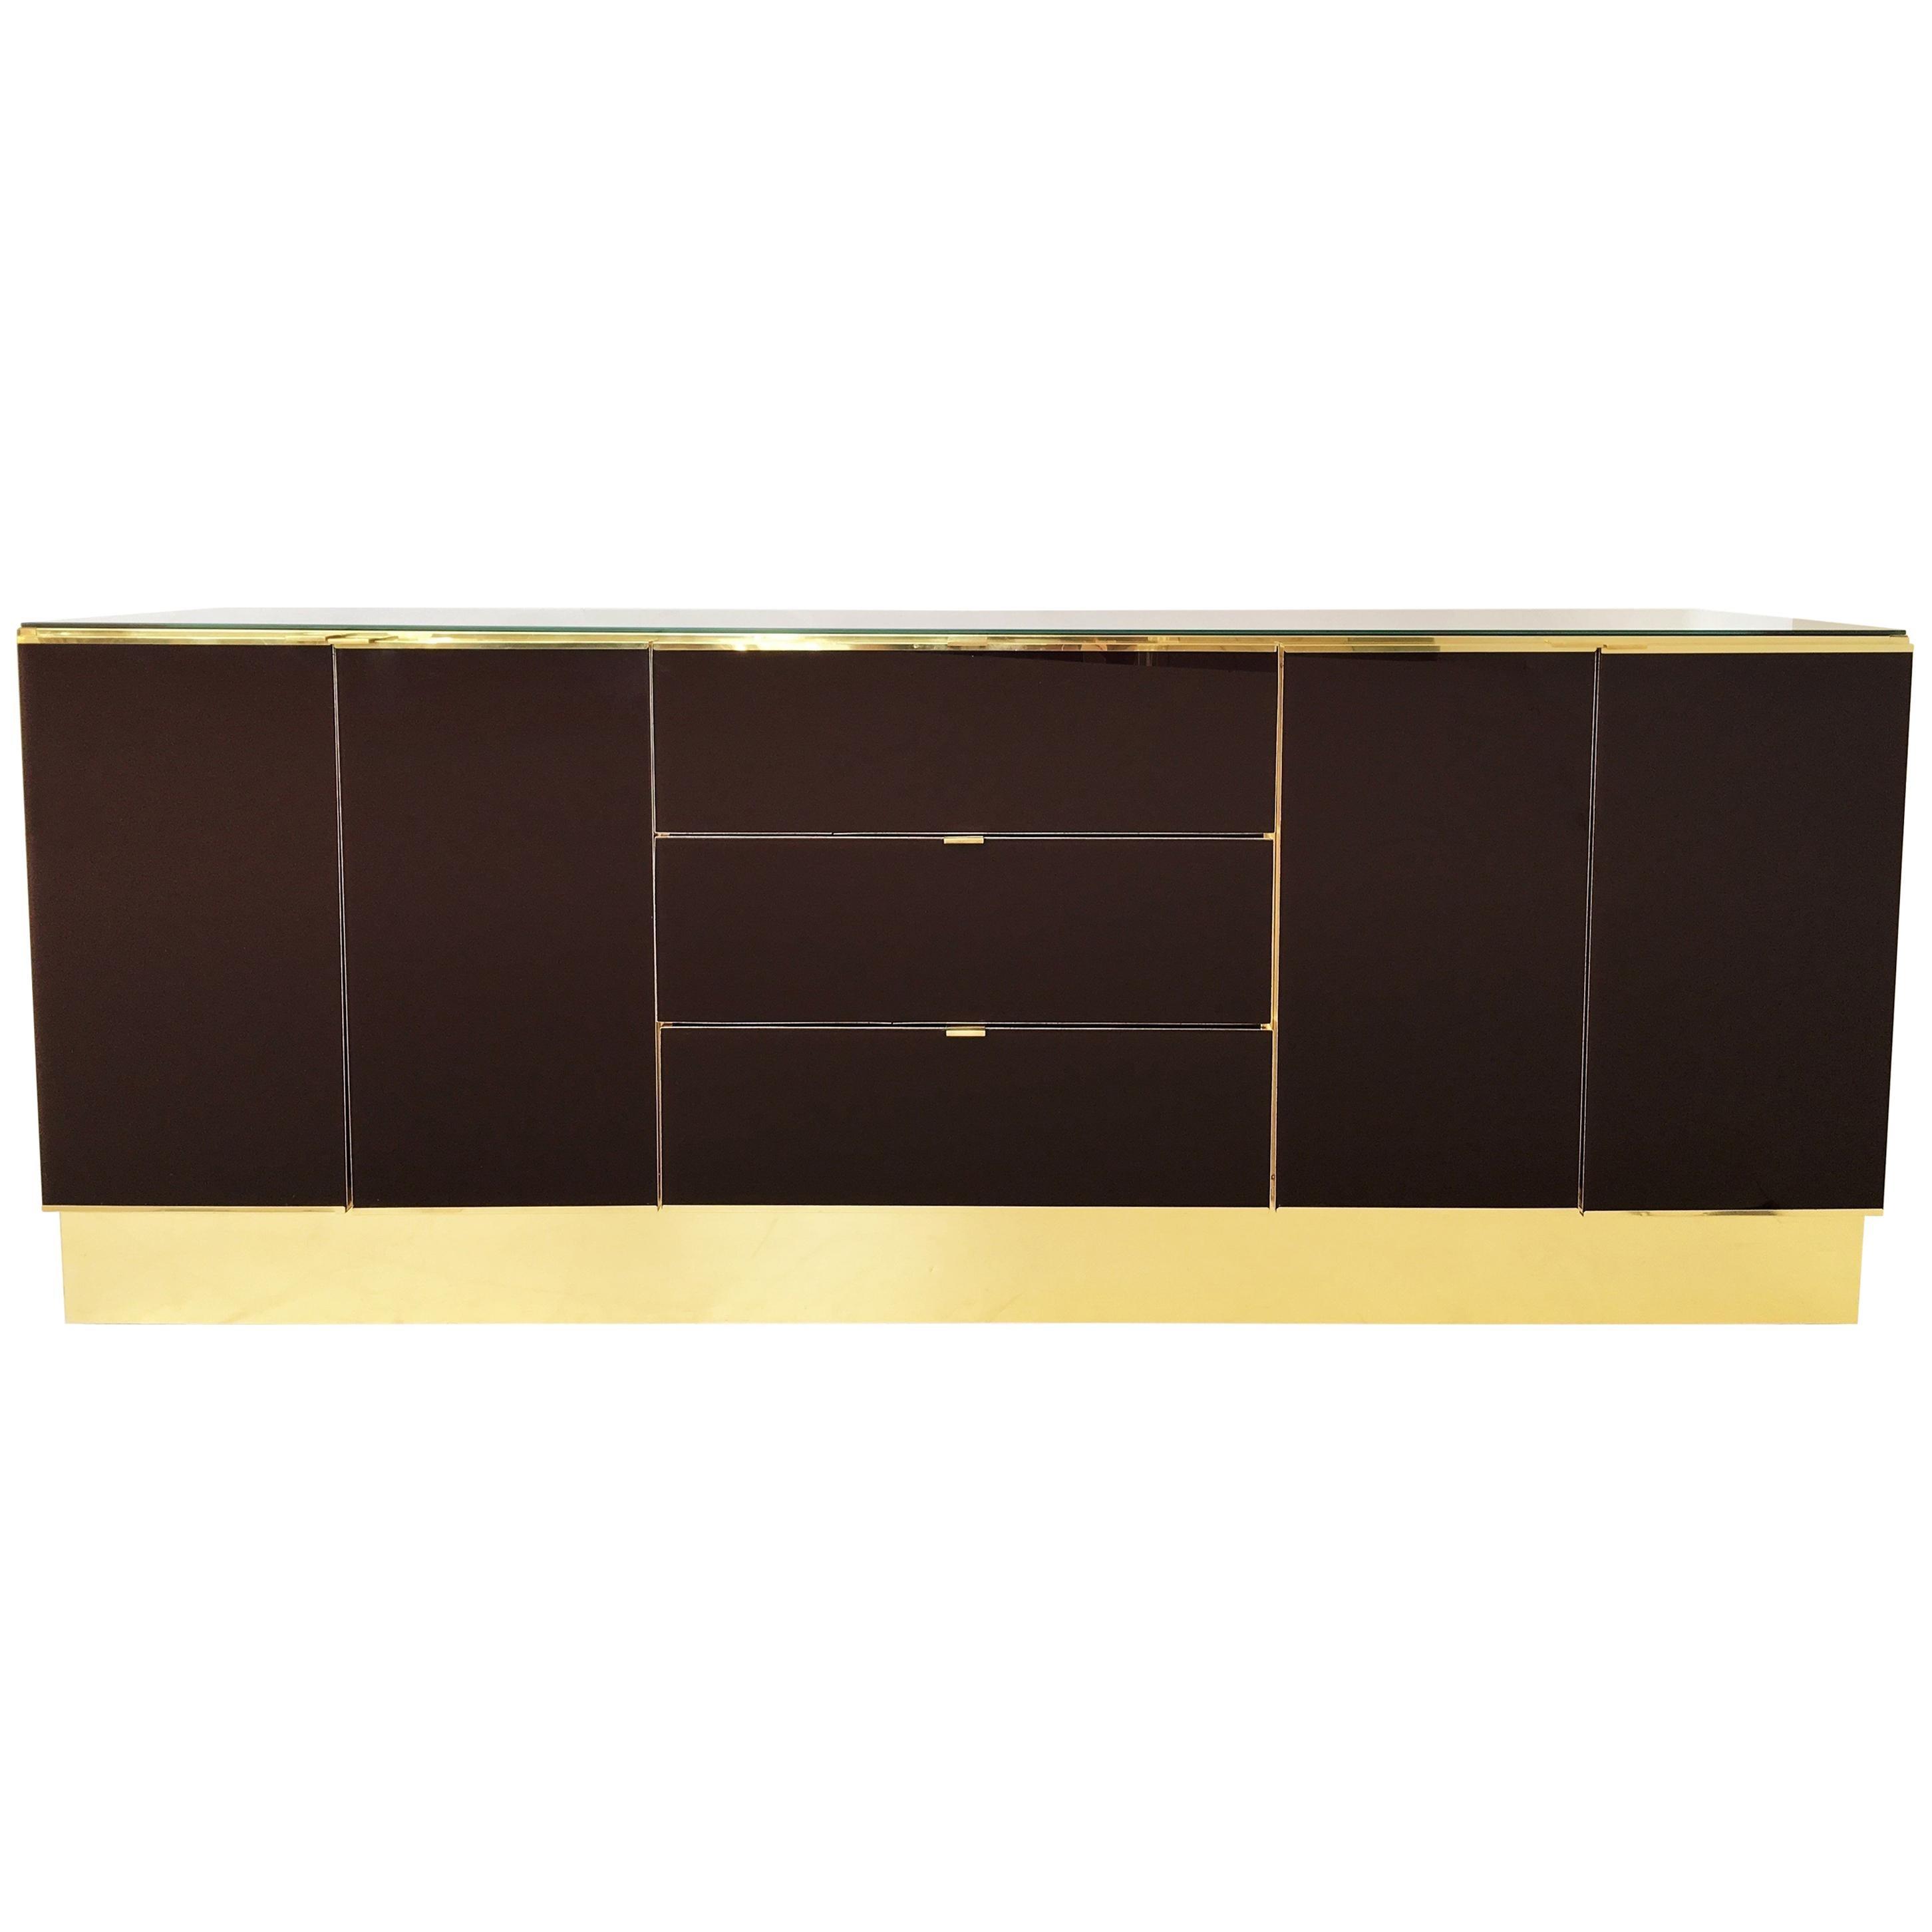 Glamorous Brass And Mirrored Dresser / Credenza By Ello Furniture